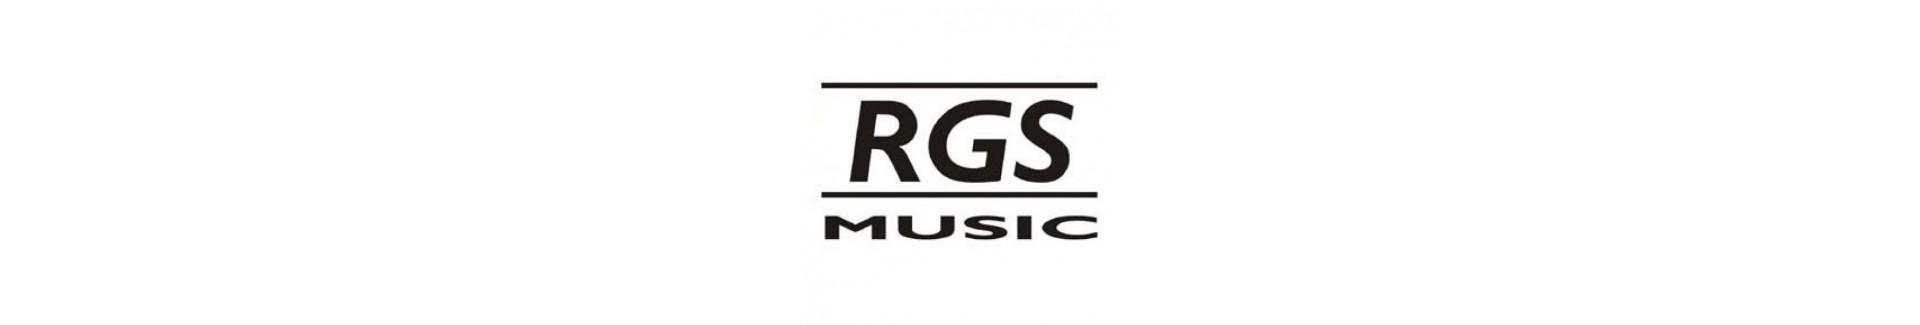 RGS Music